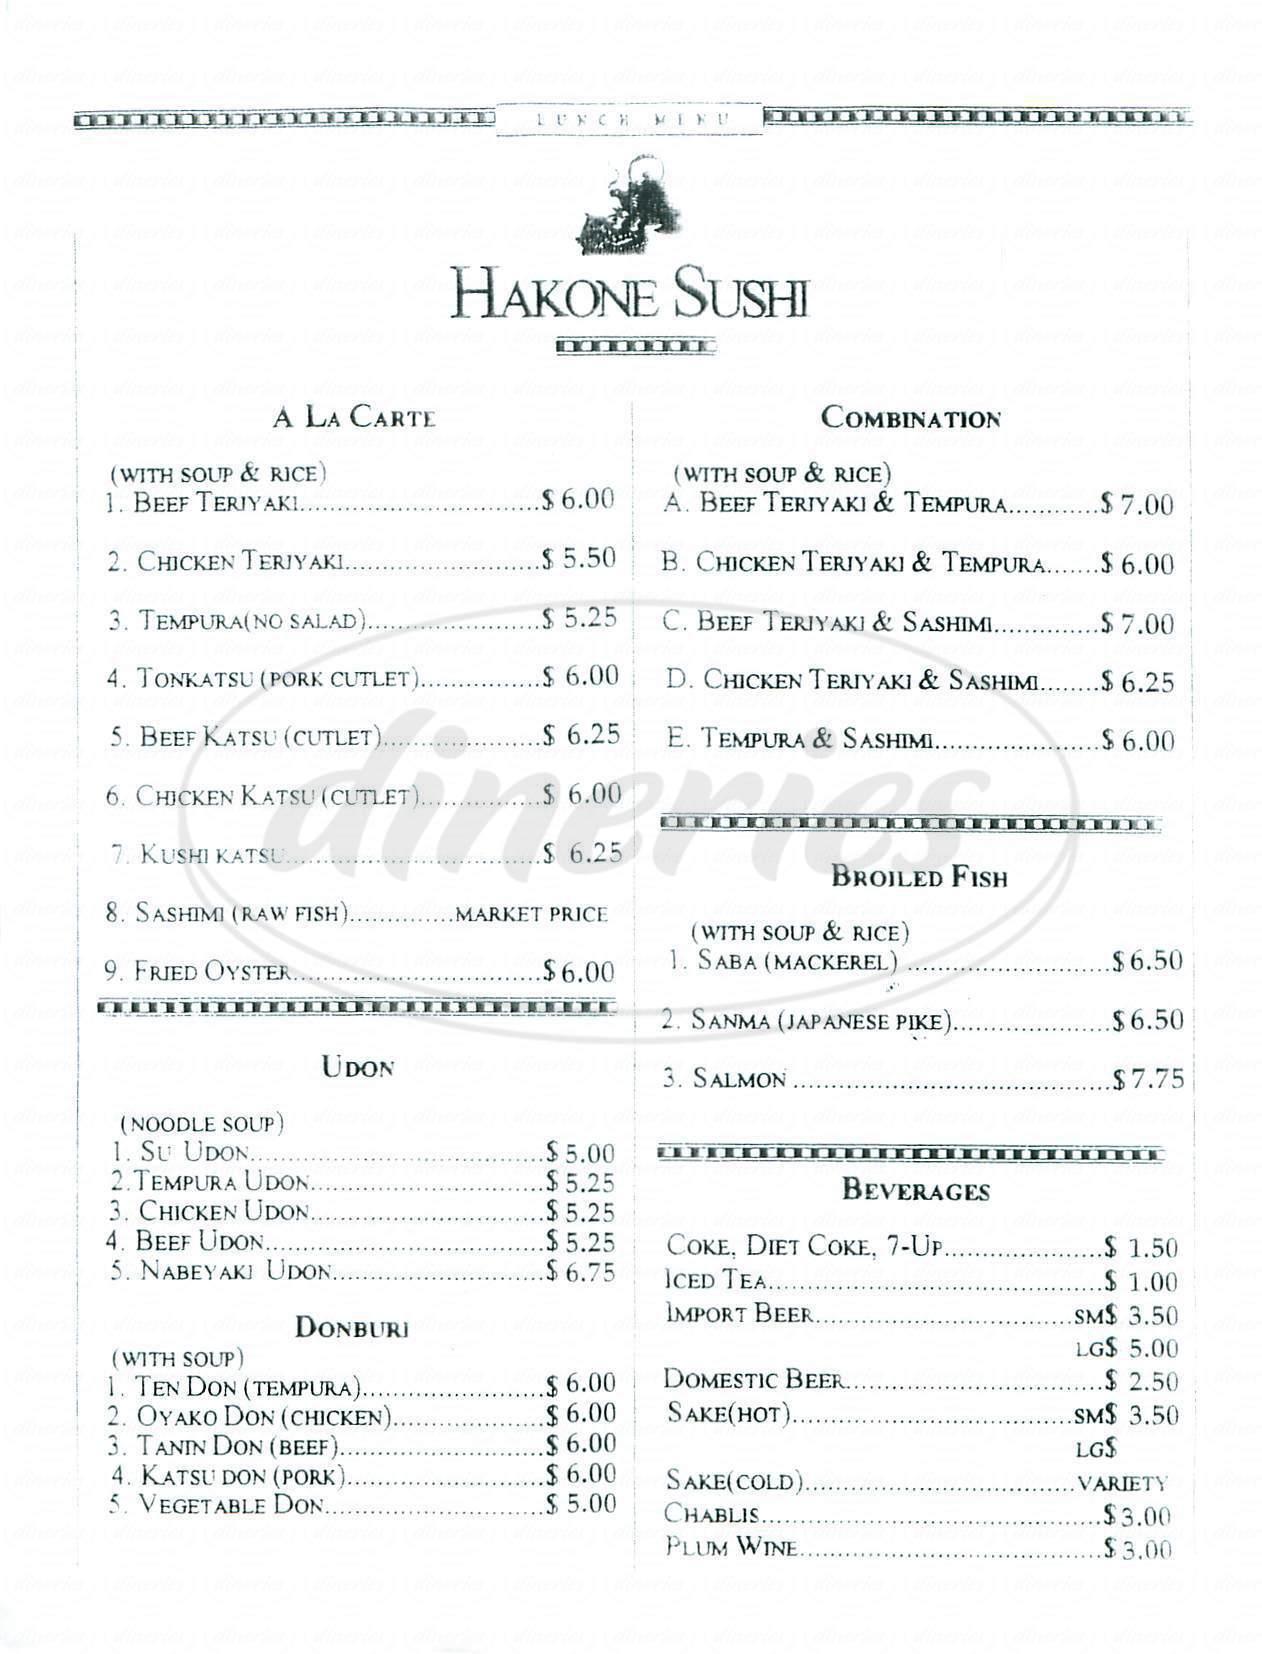 menu for Hakone Sushi